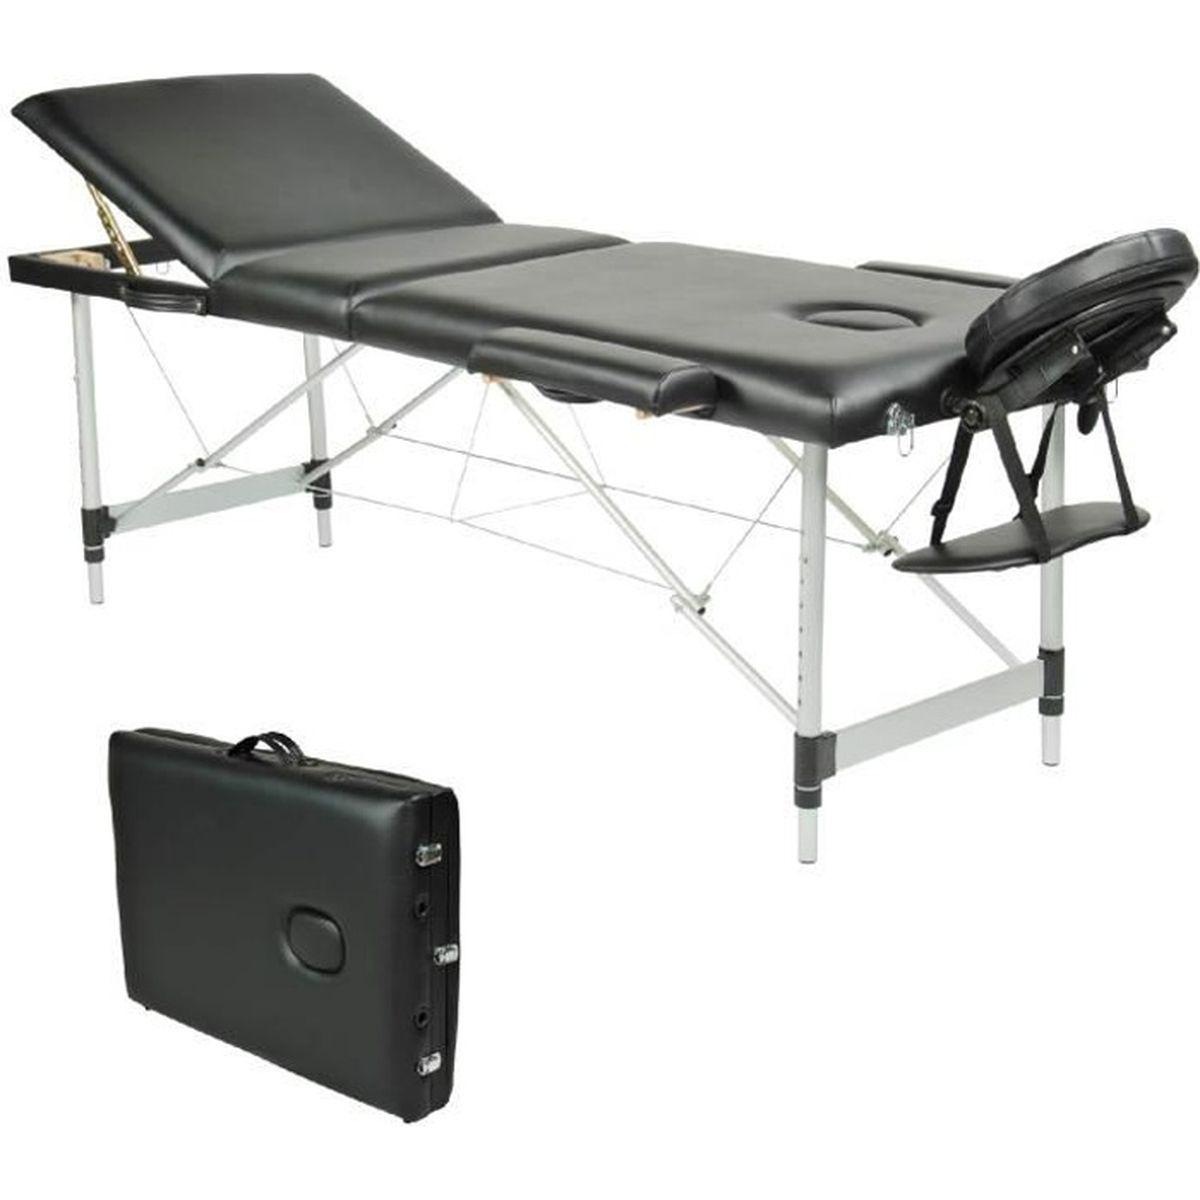 Table de Massage Pliante Portable 6 Zones en Aluminium Noir +